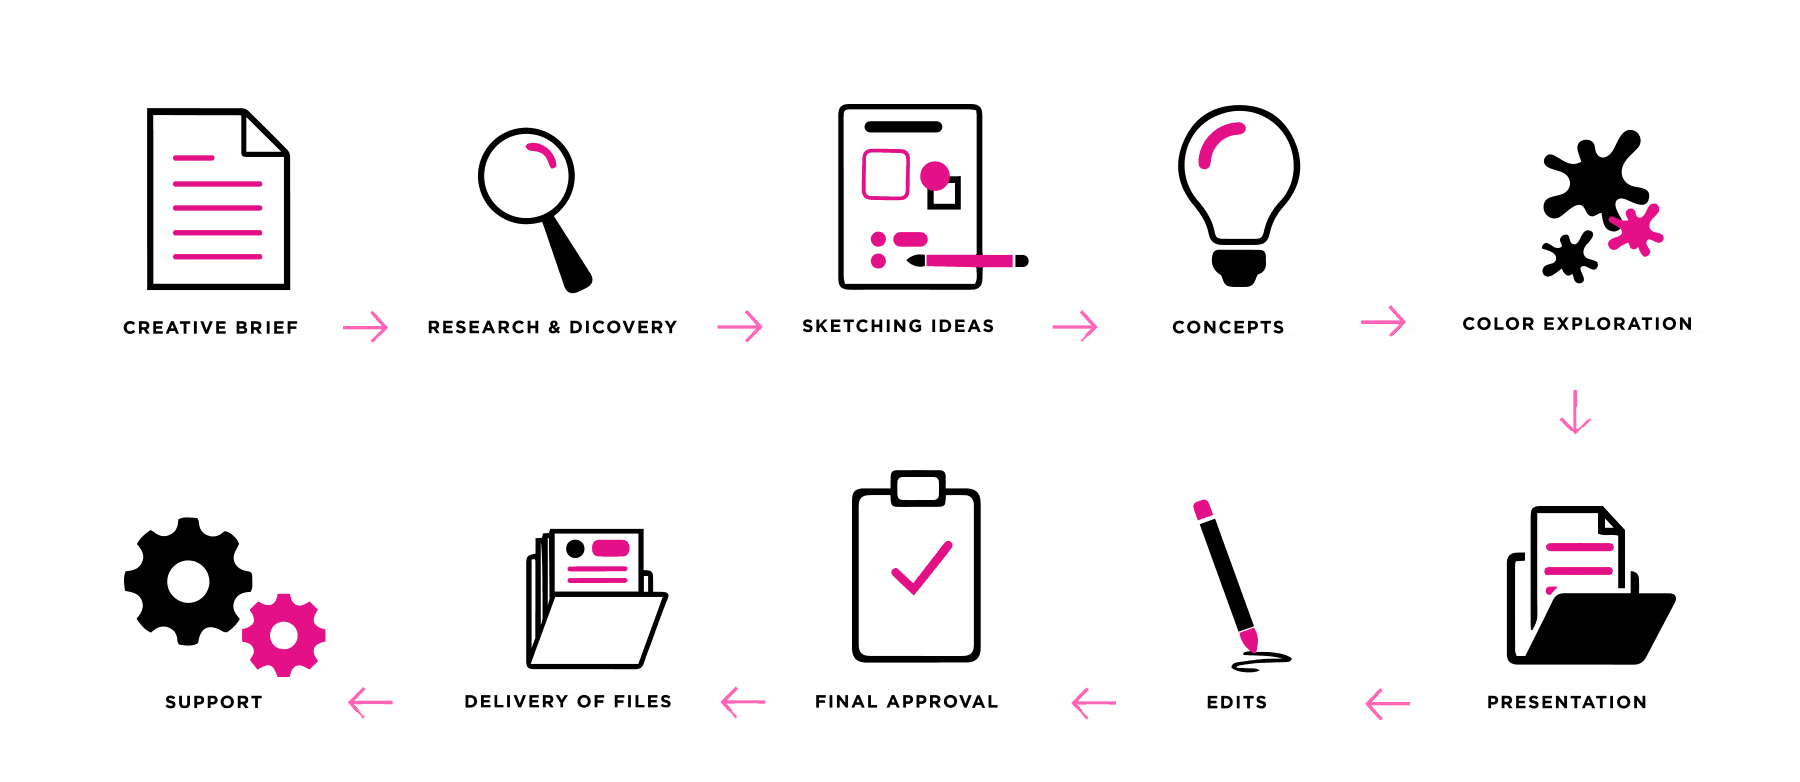 design-process-1800x782-1 copy